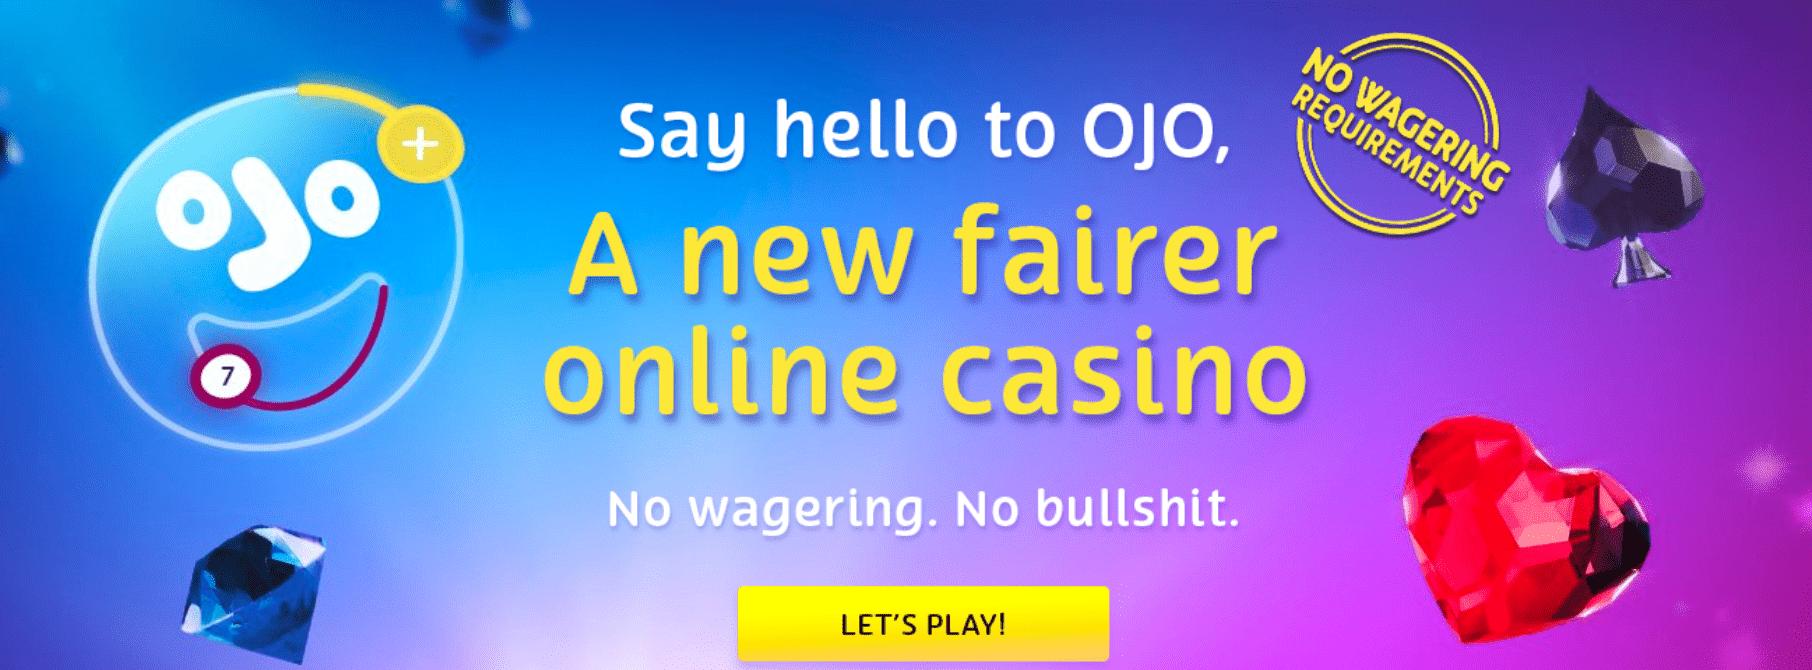 Playojo no wagering